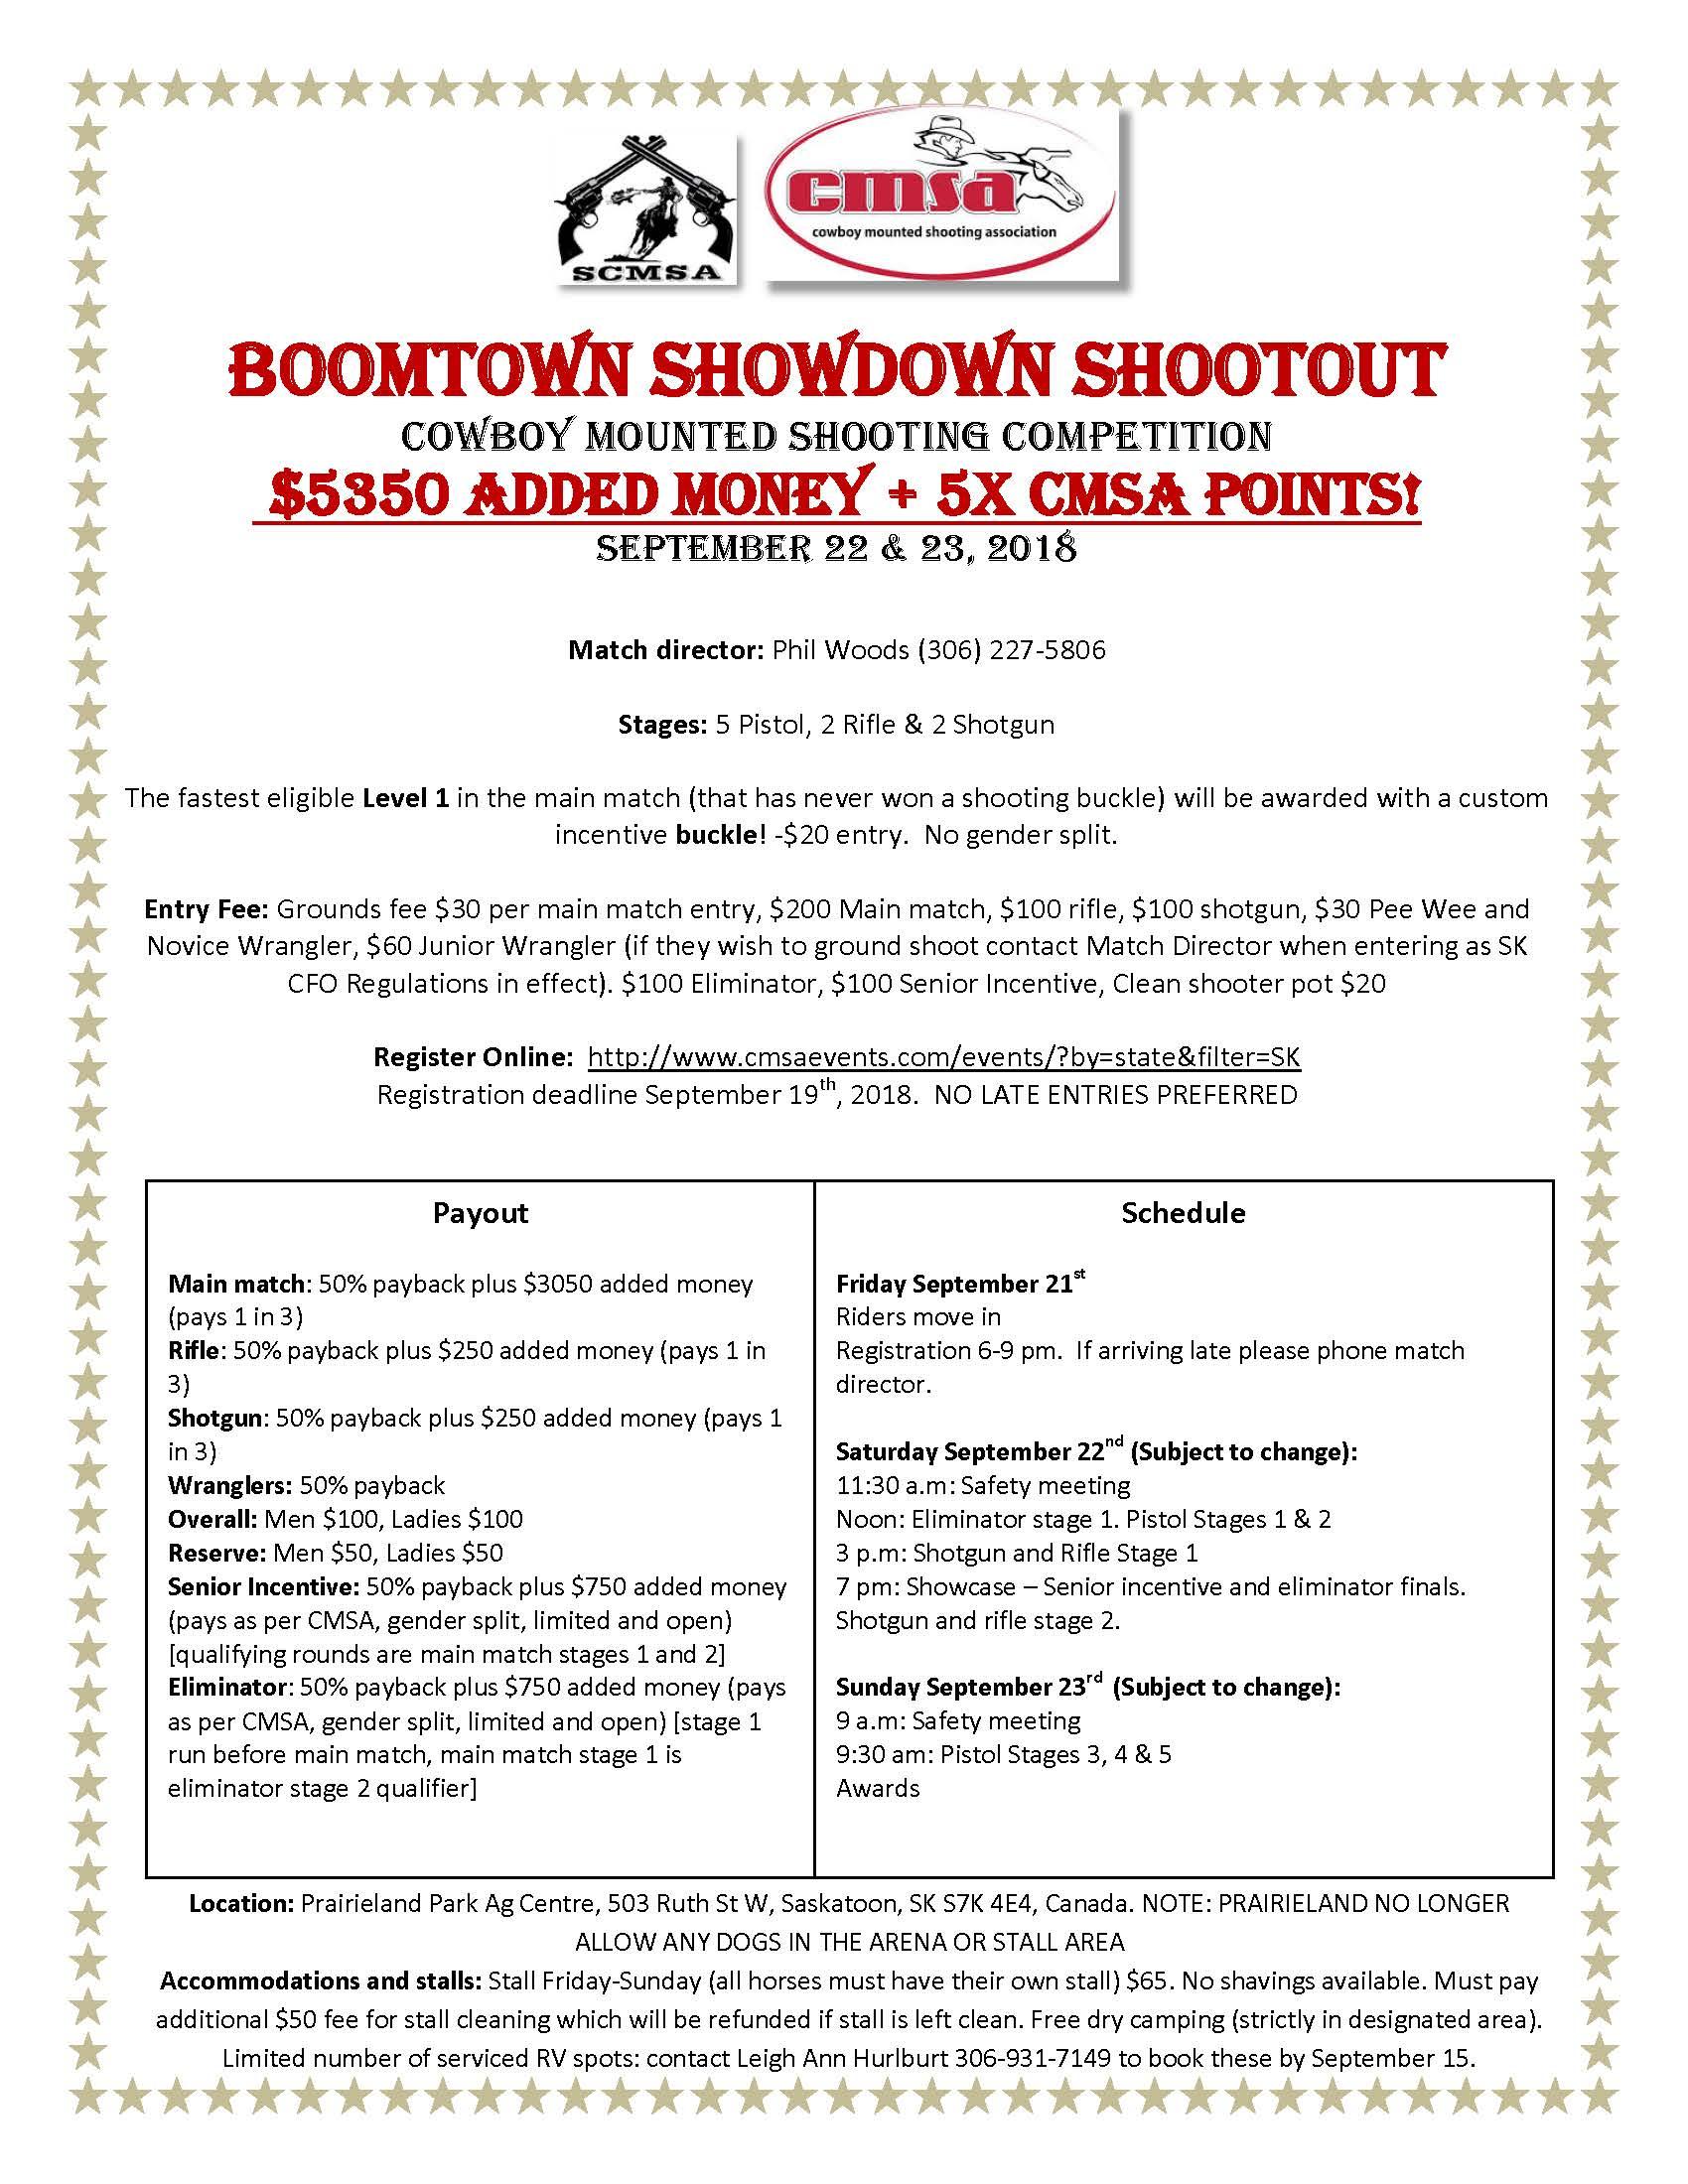 Boomtown Showdown Shootout